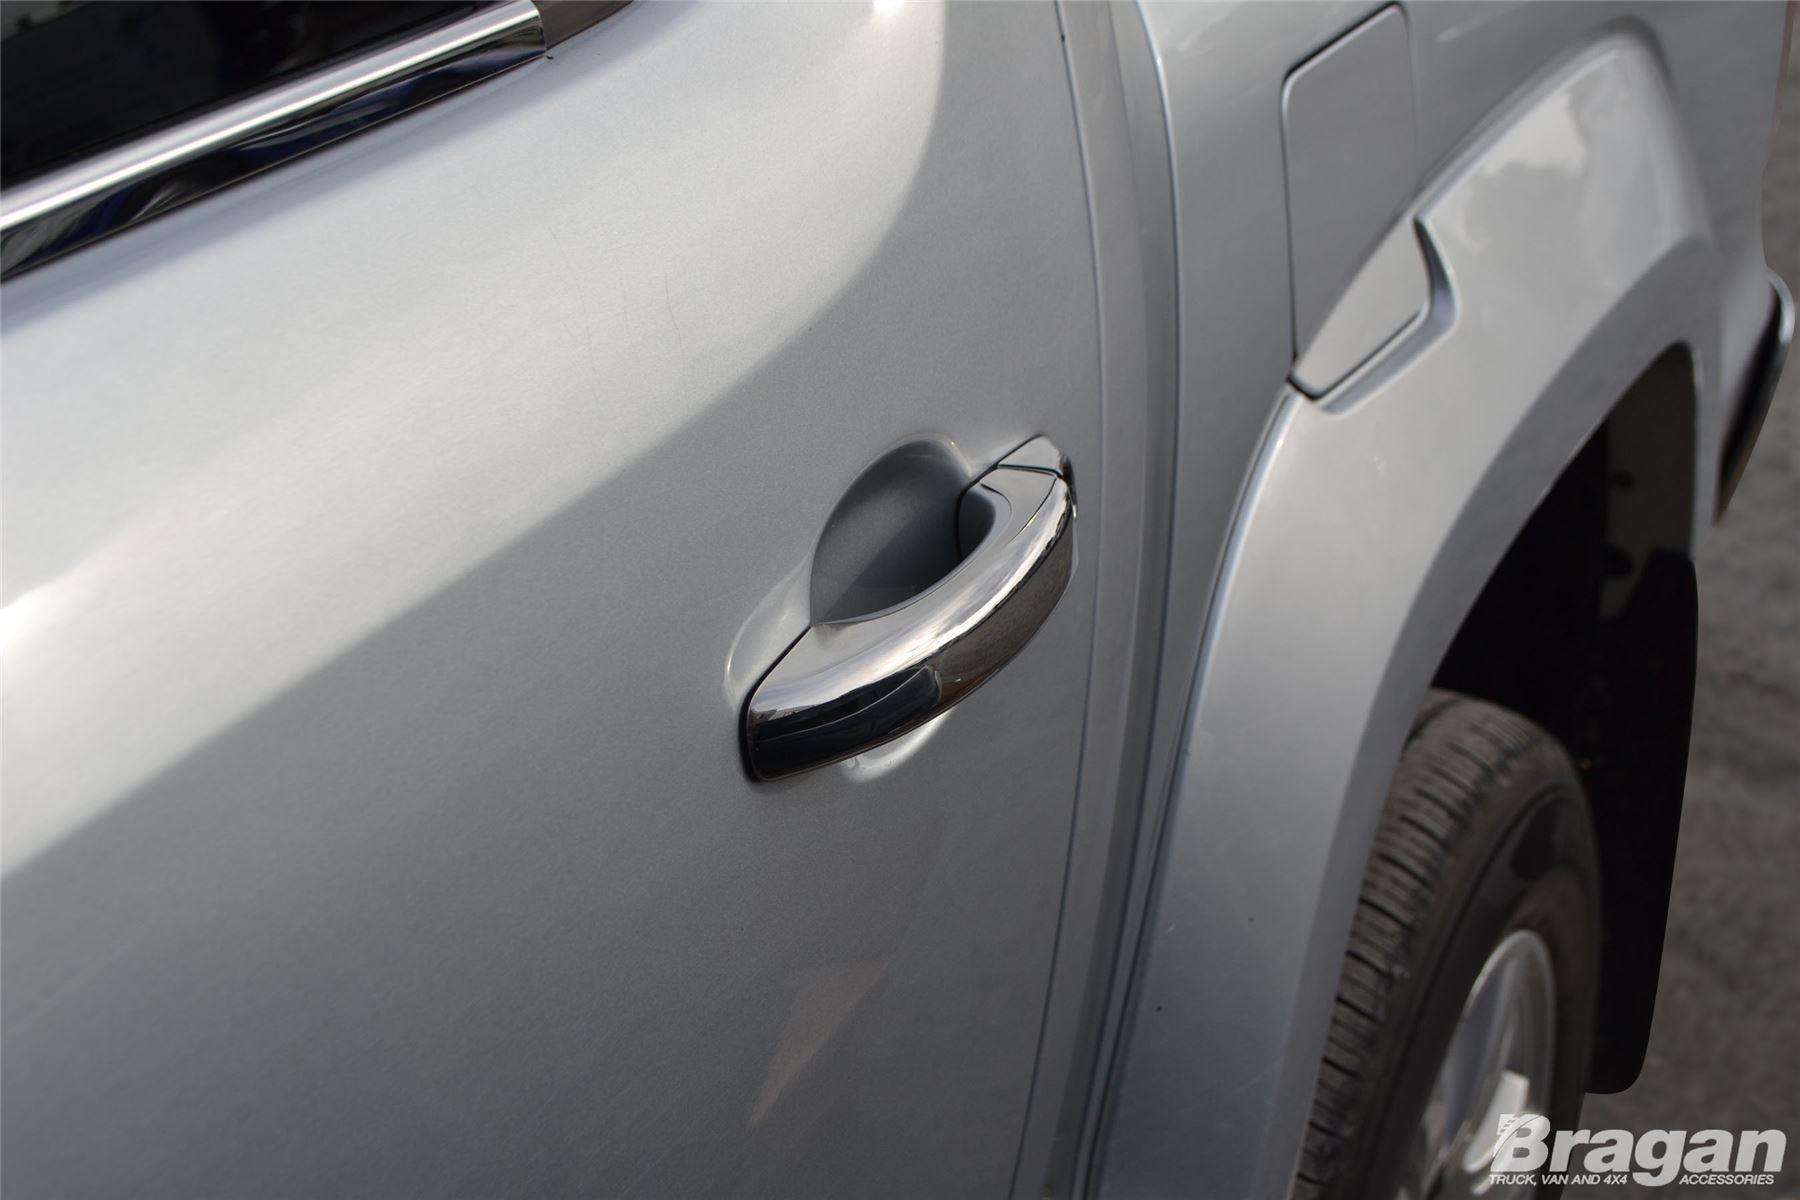 To Fit 2006-2014 Volkswagen Crafter Chrome Door Handle Cover Trim Piece 8pce Set